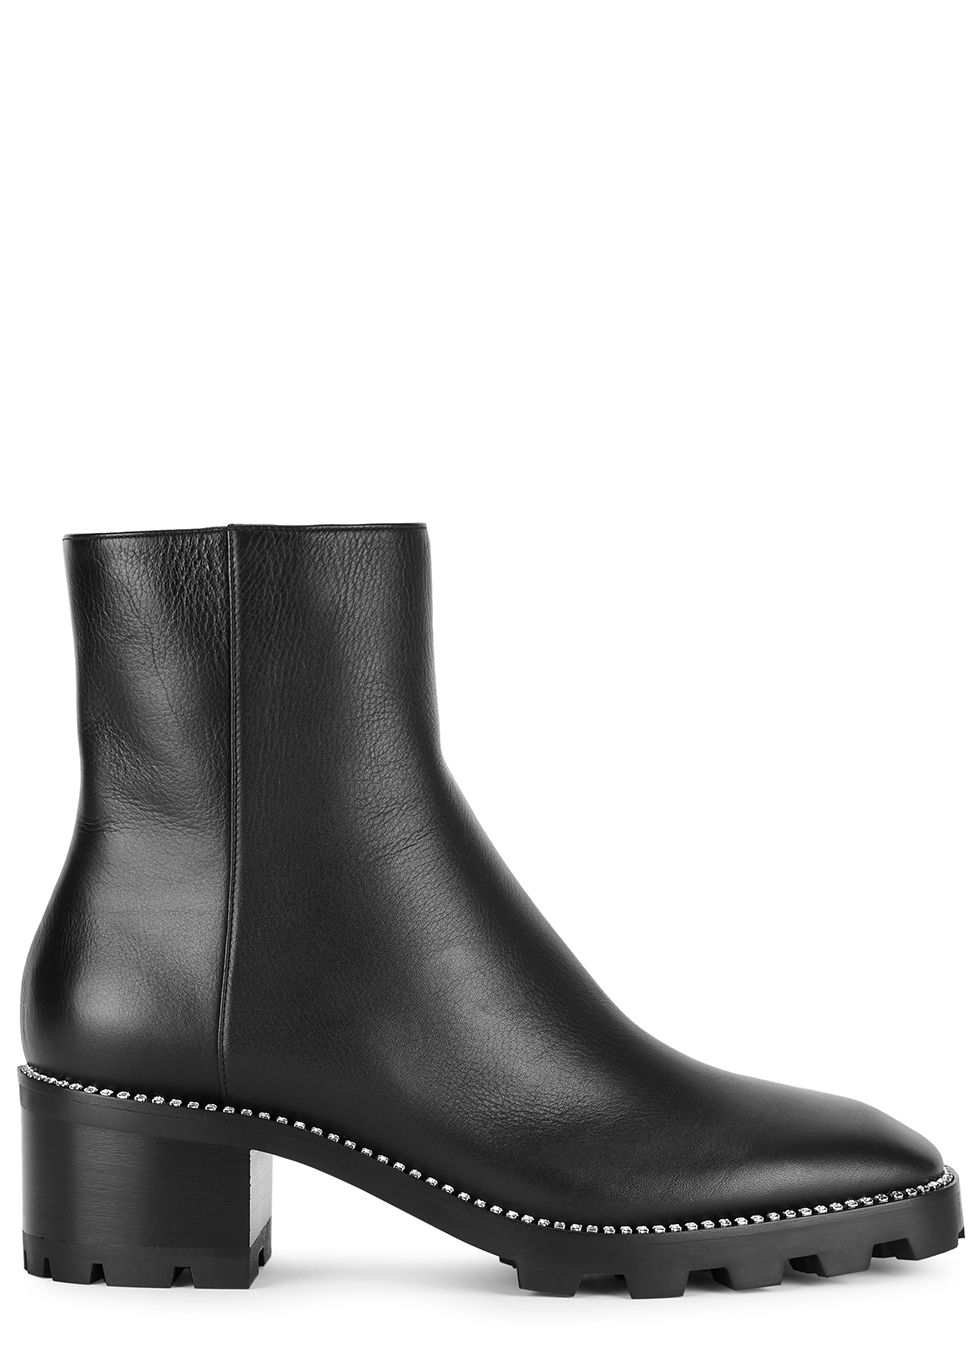 Mava 50 embellished leather Chelsea boots